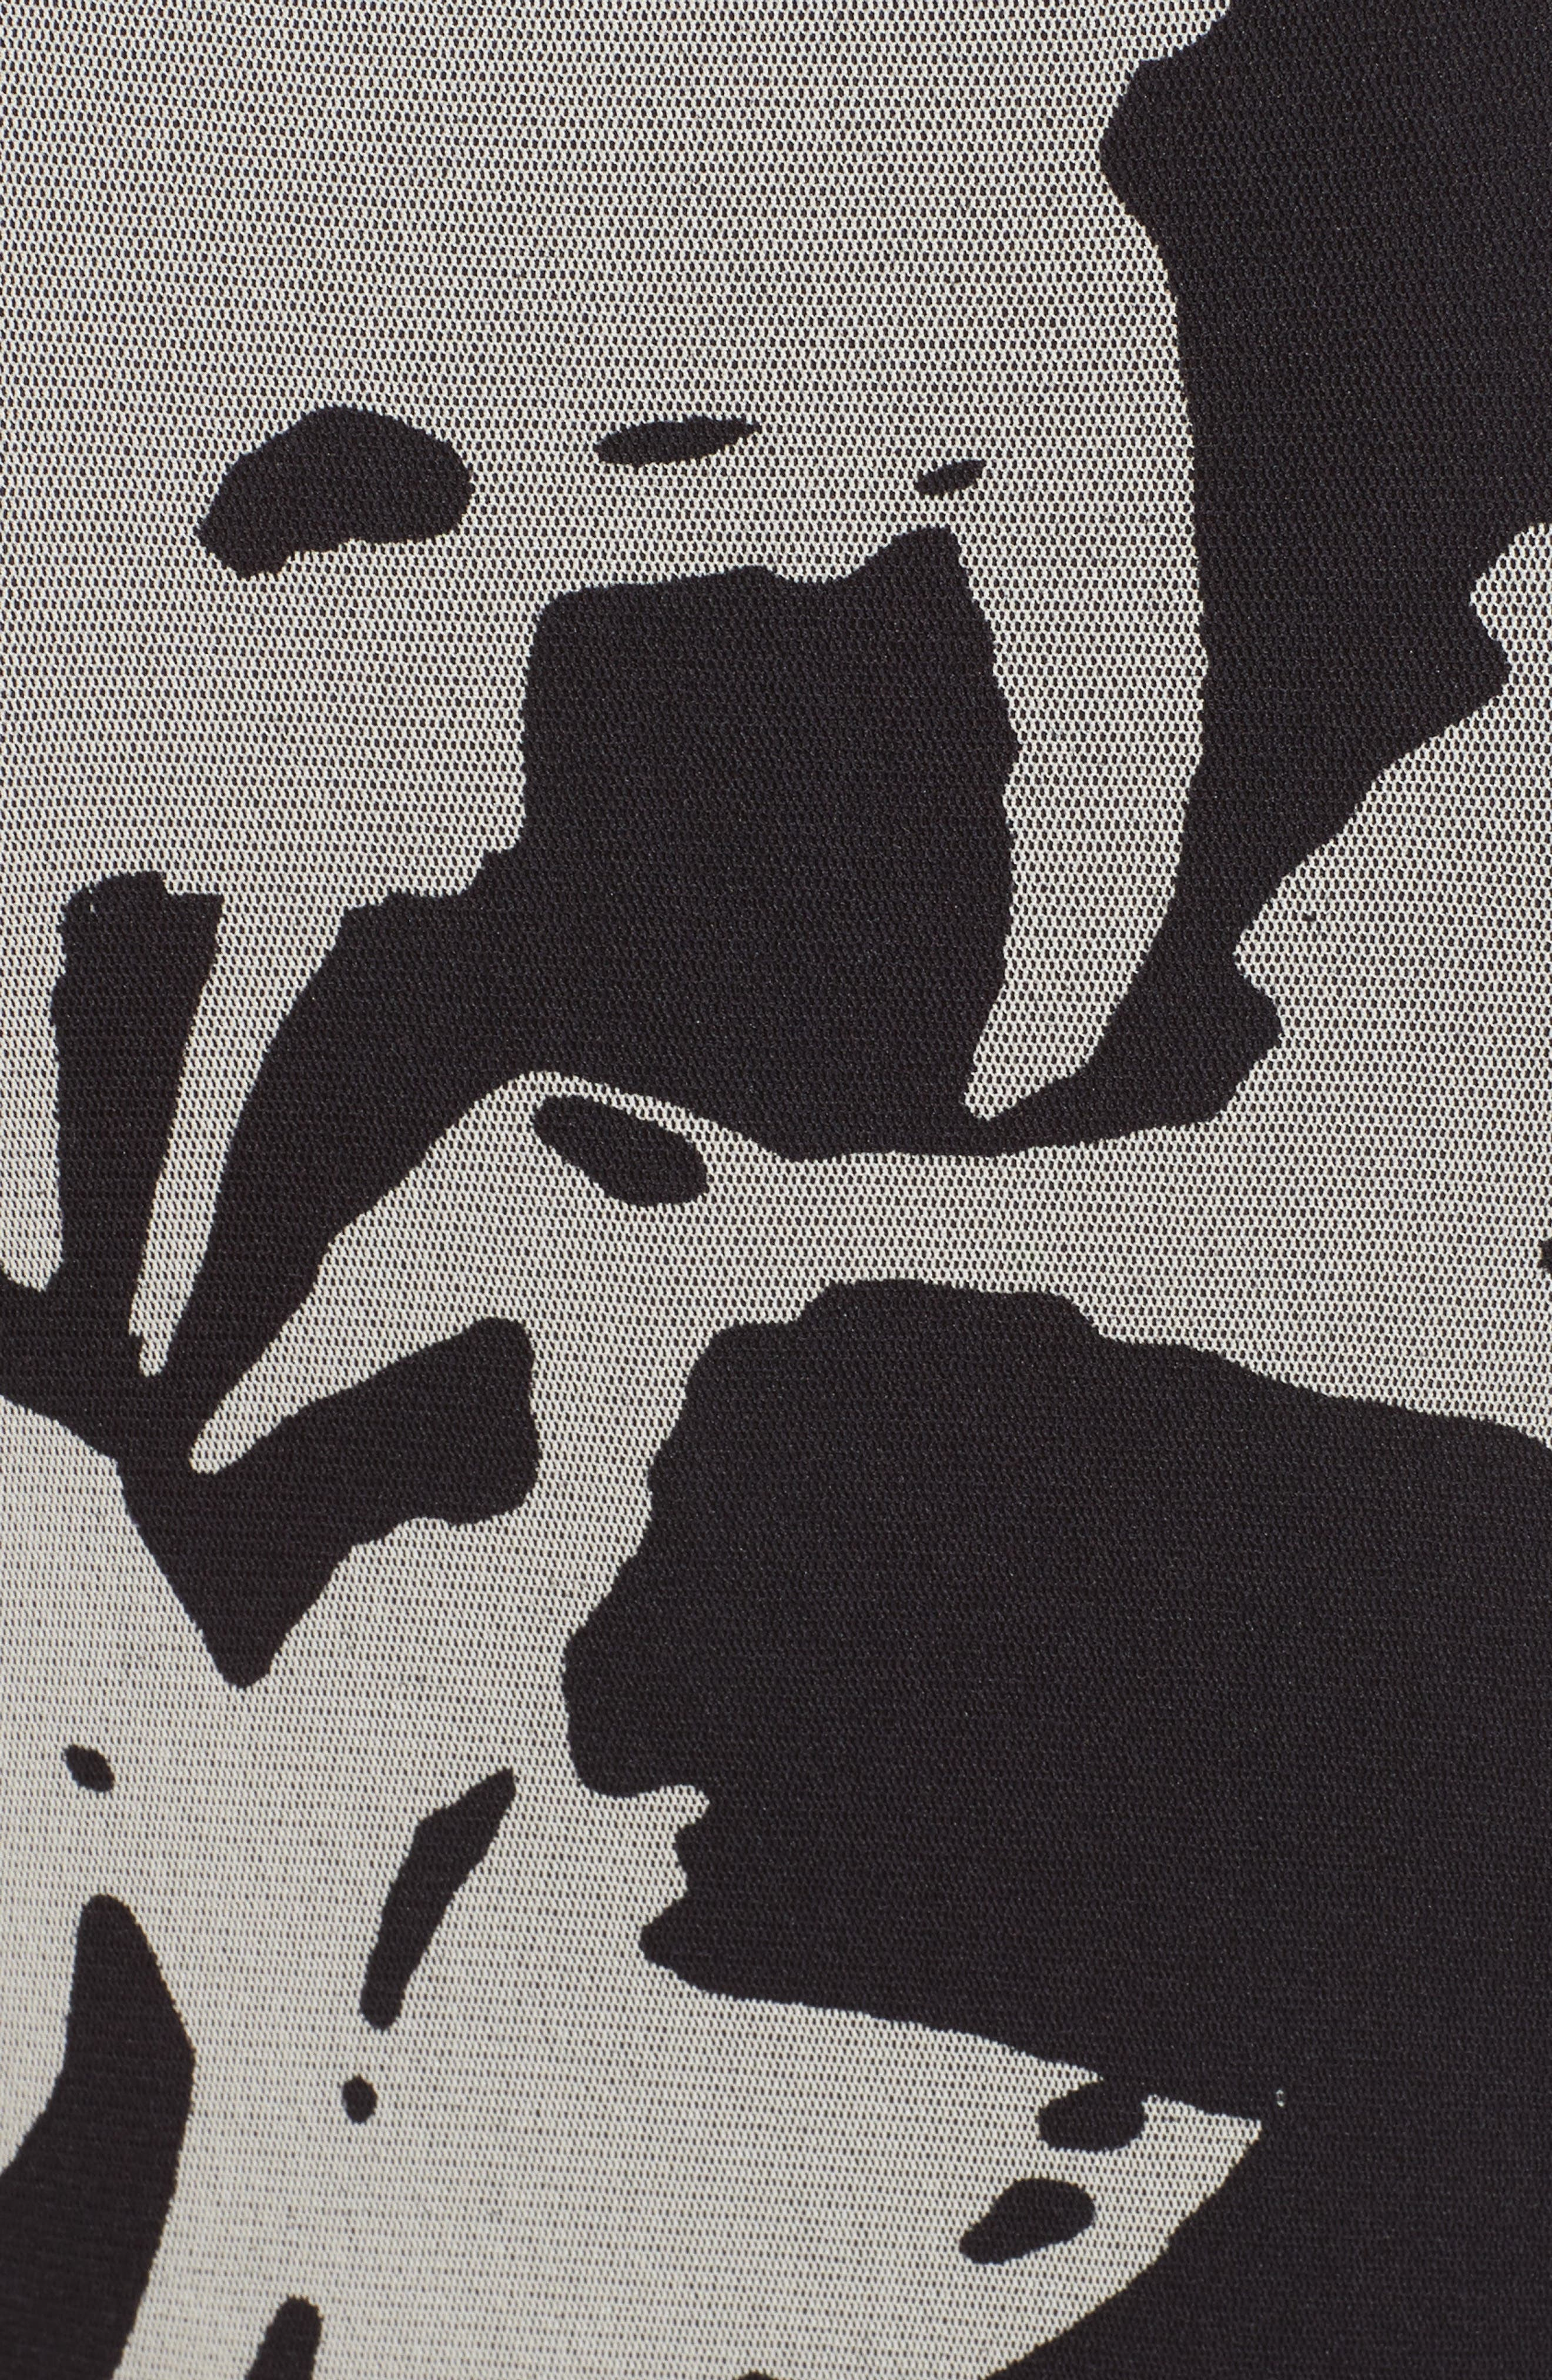 Bicolor Floral Print Tulle Maxi Dress,                             Alternate thumbnail 5, color,                             001